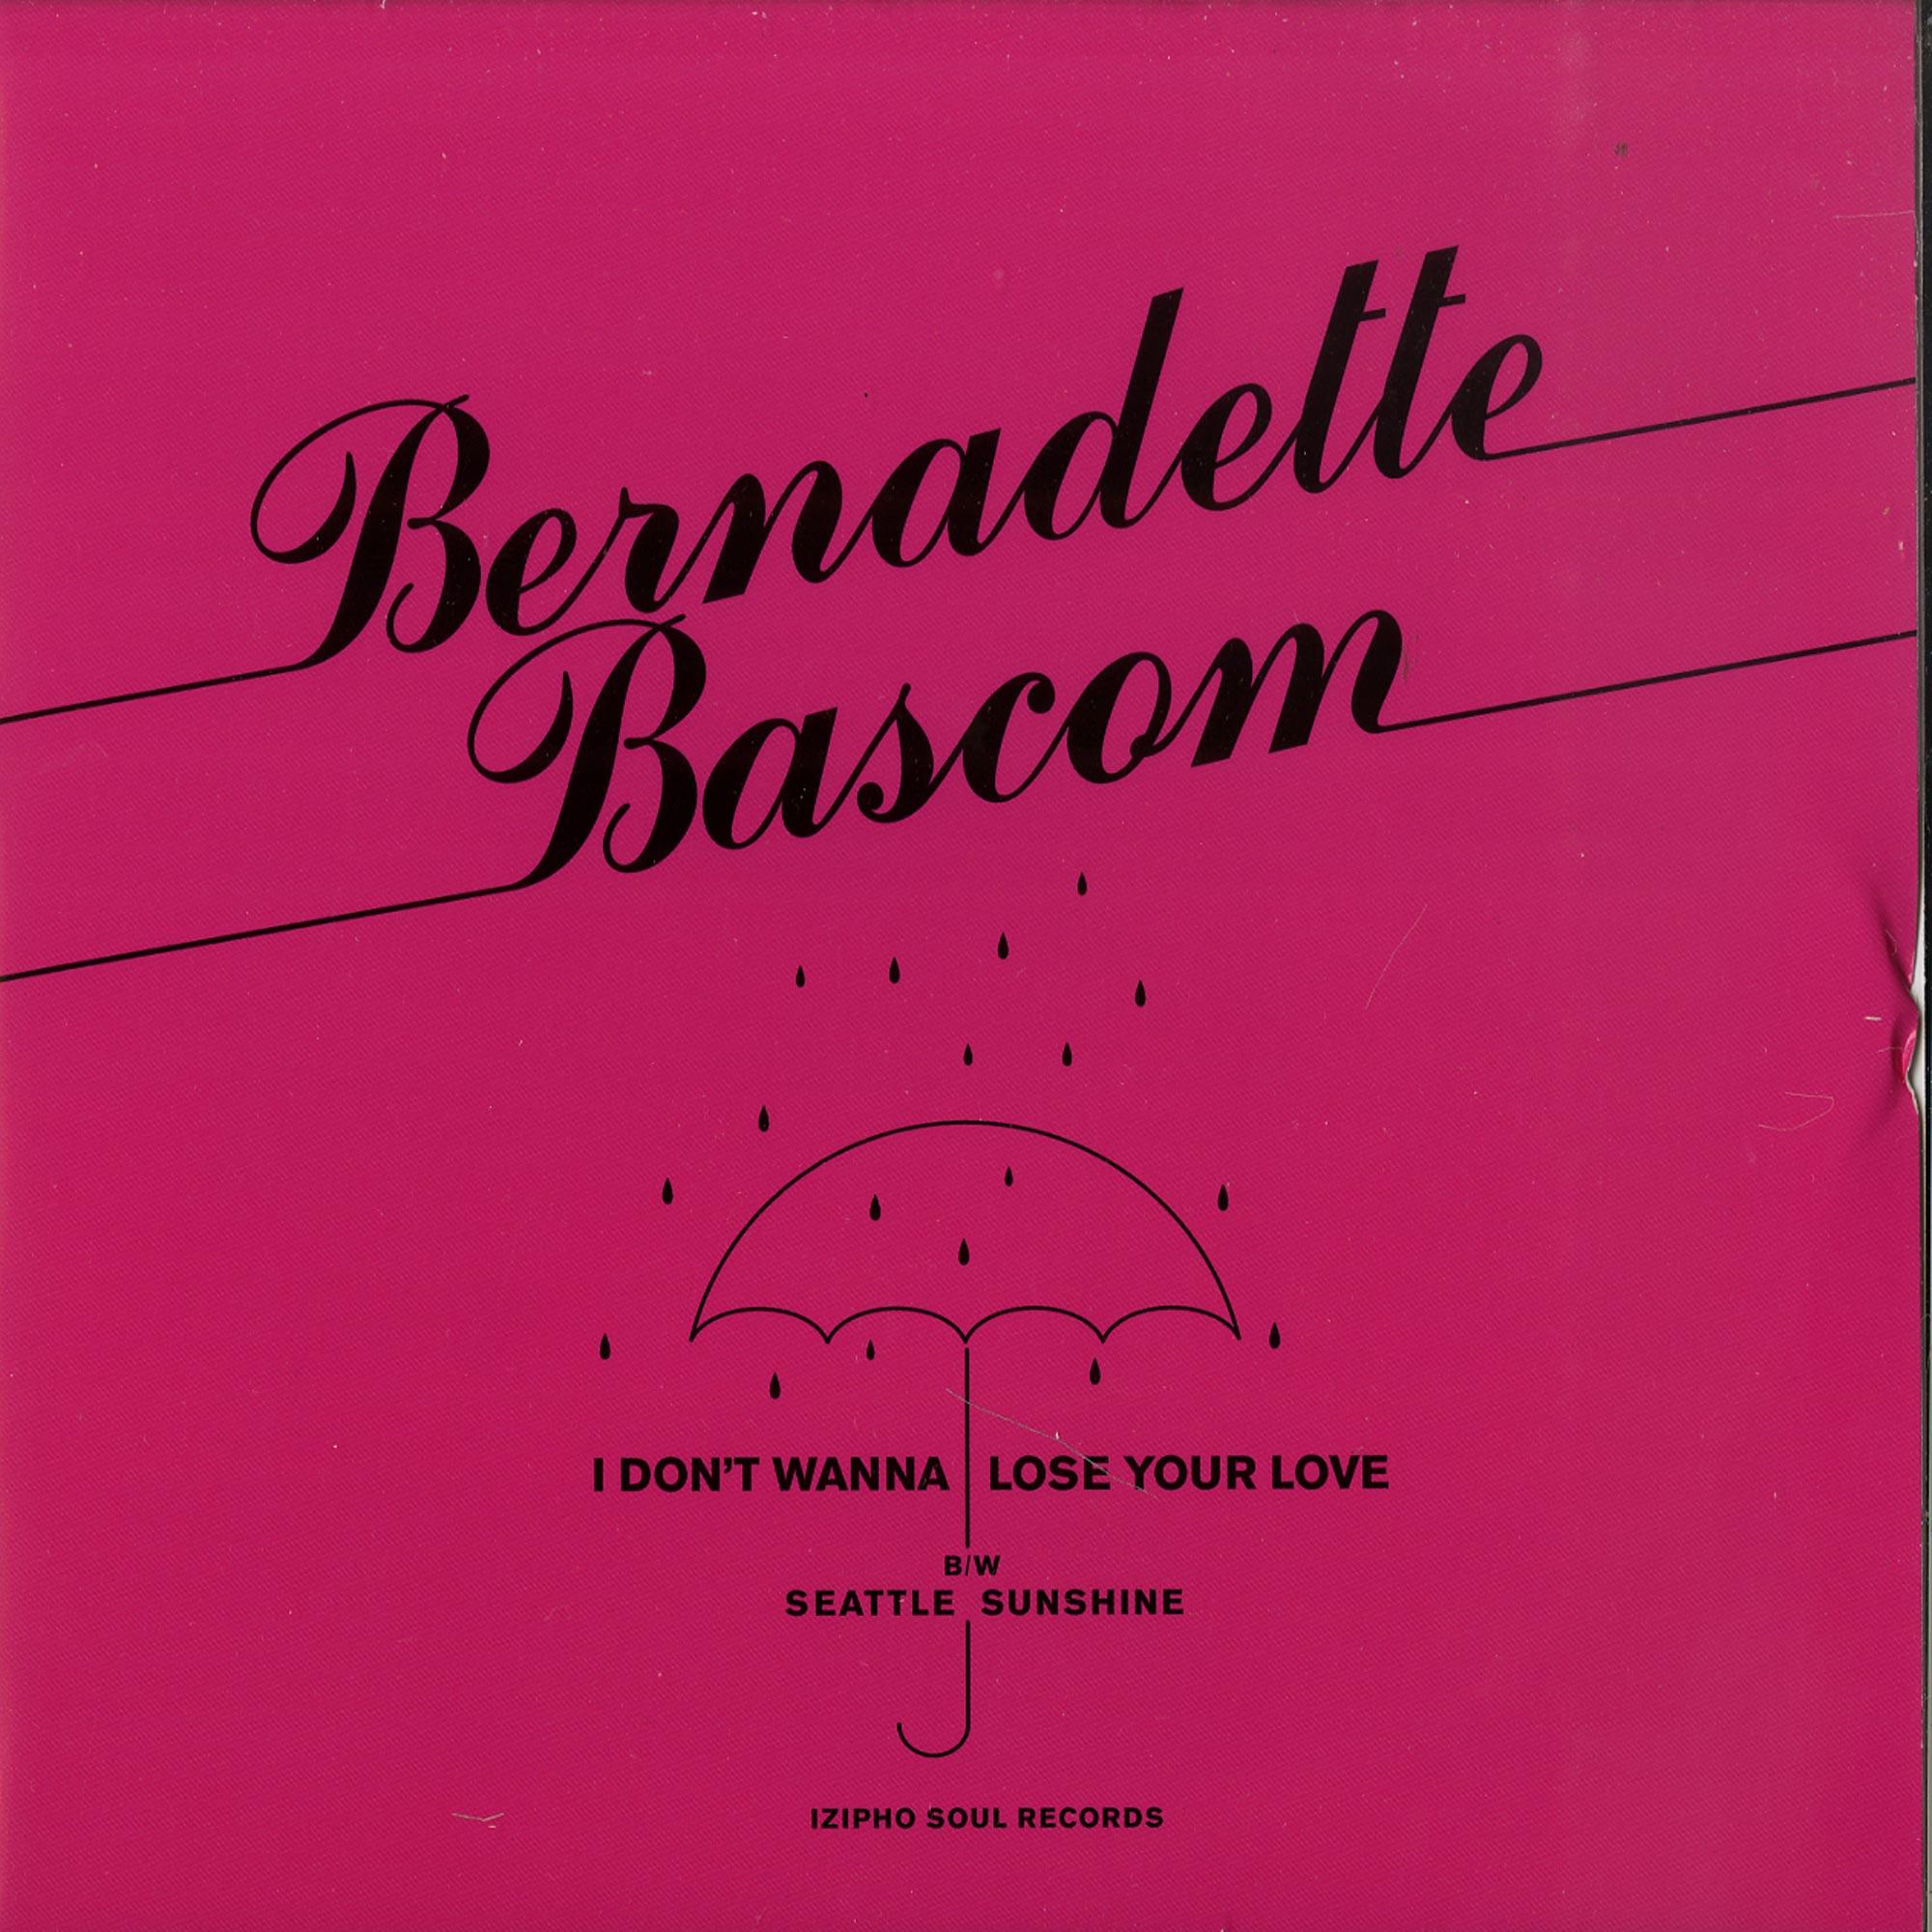 Bernadette Bascom - I DONT WANNA LOSE YOUR LOVE